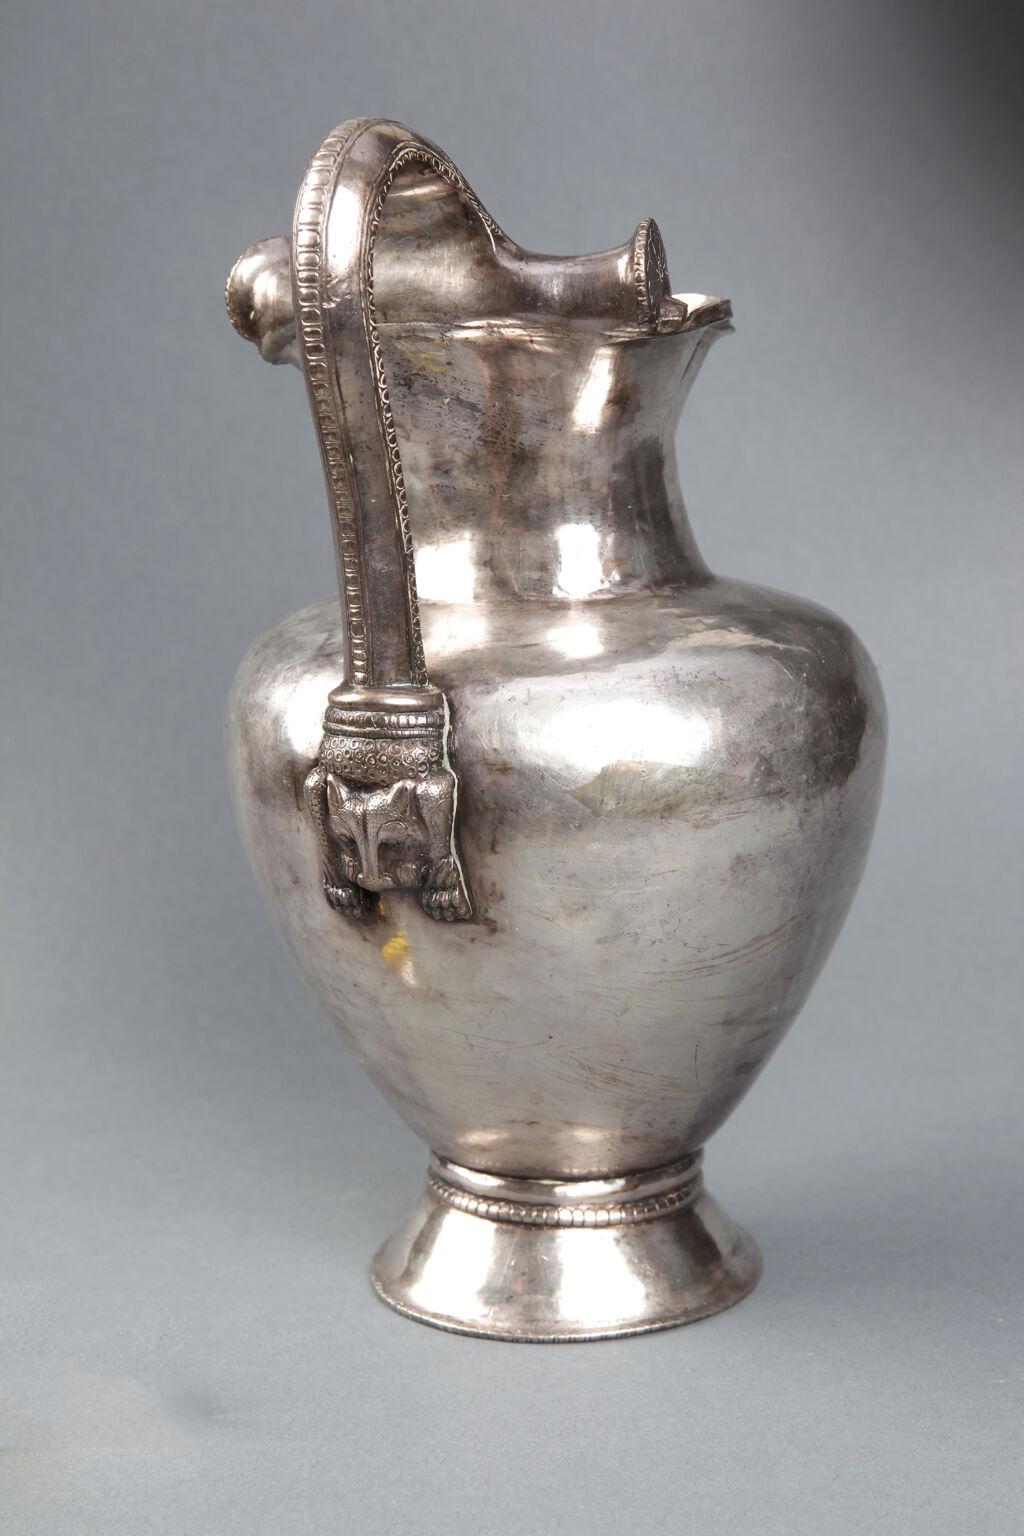 Silver oinochoe with lion's head handle